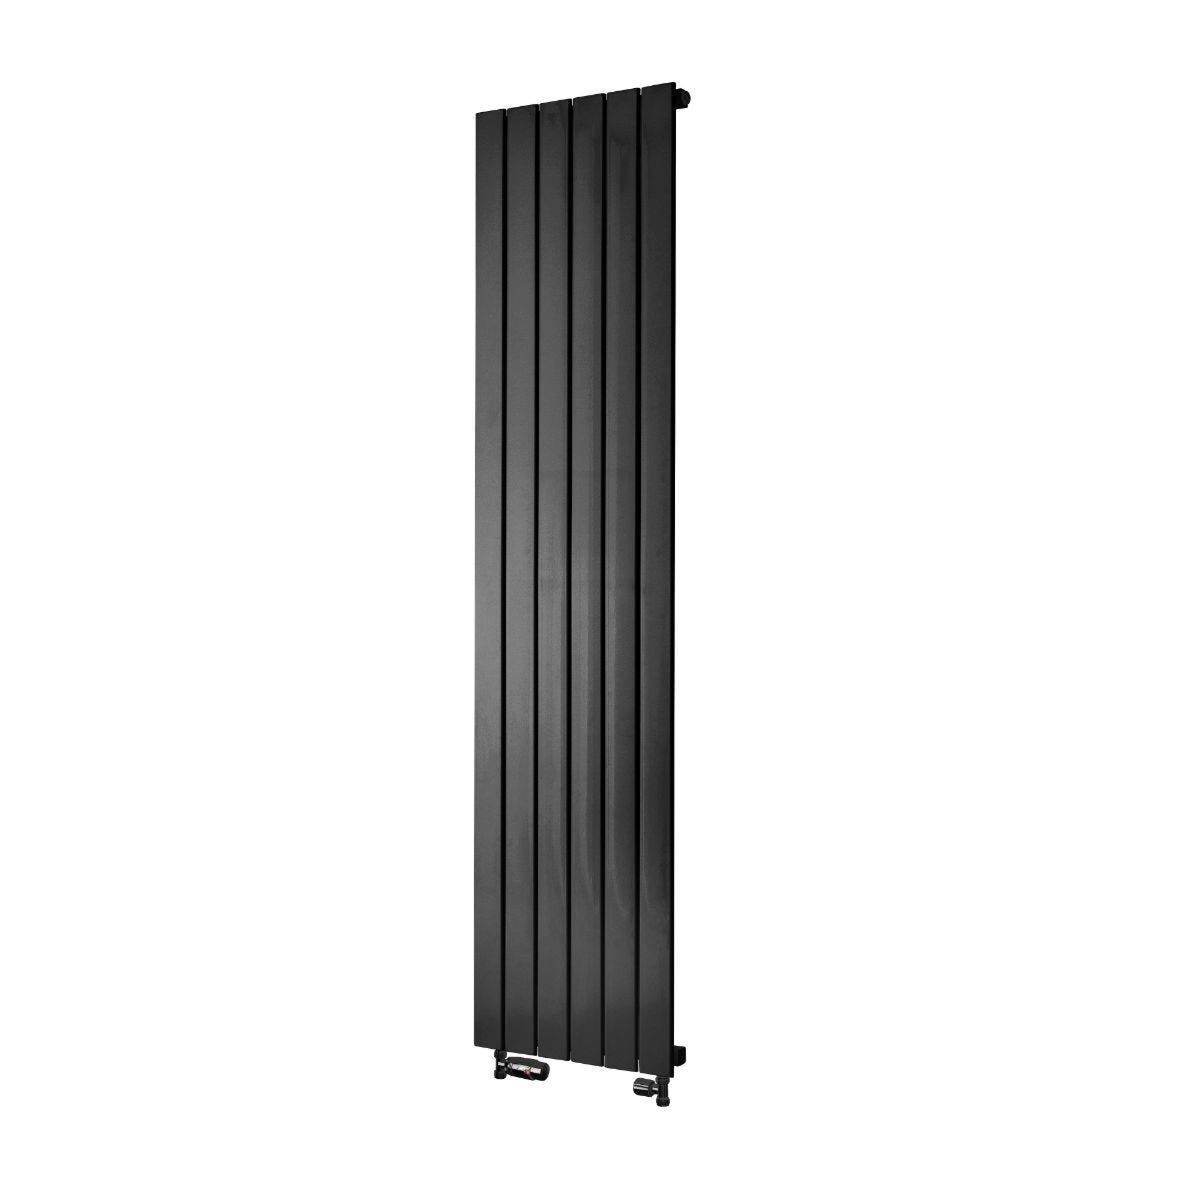 Towelrads Oxfordshire Vertical Radiator - Gun Metal 1800x465